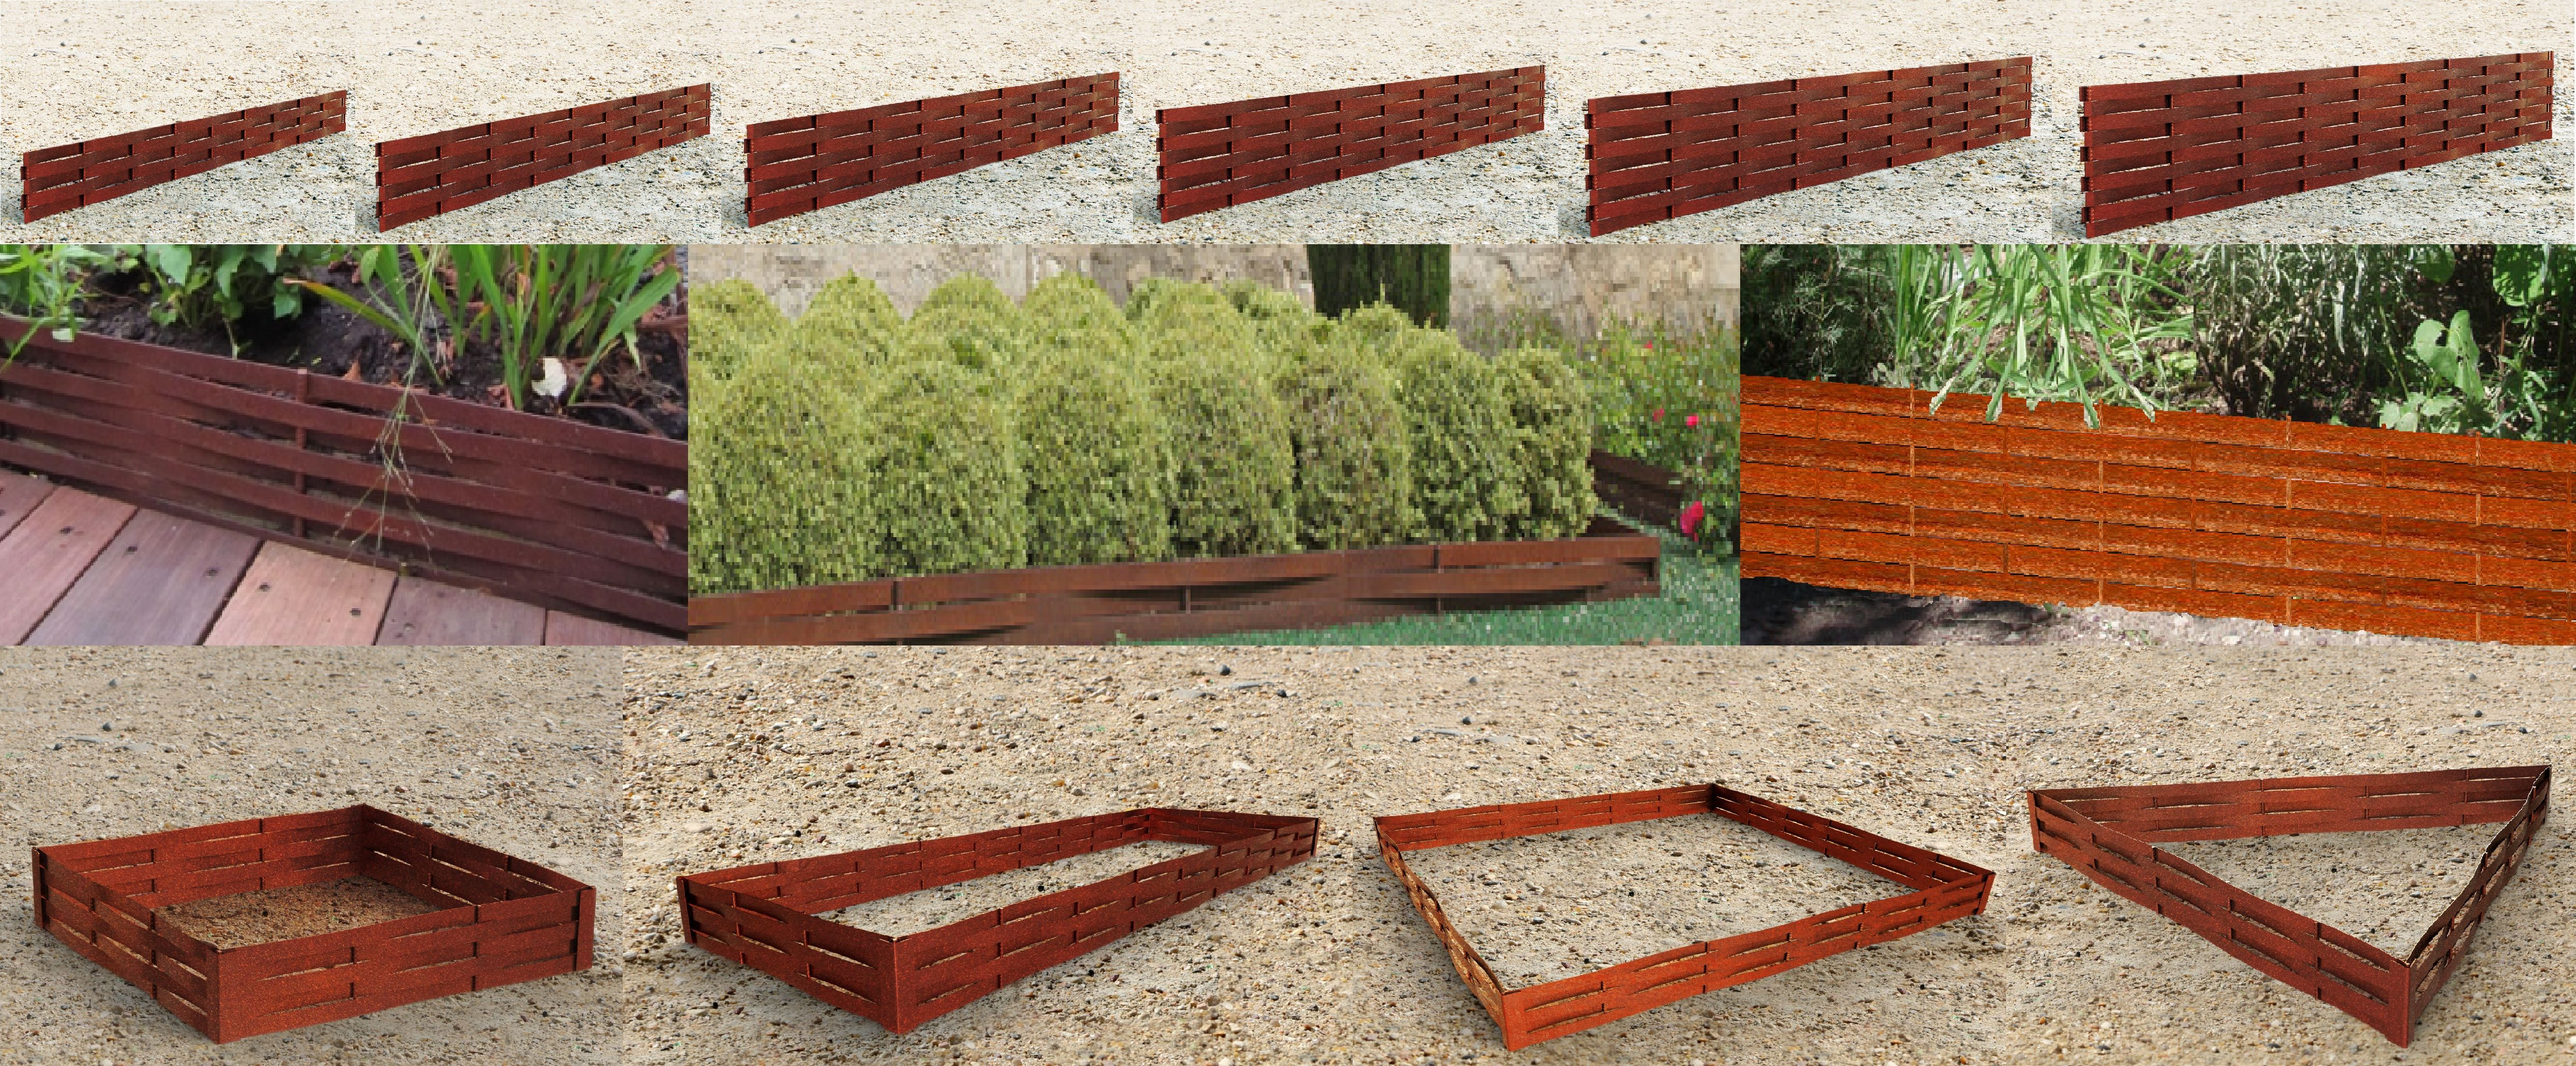 bordure jardin affordable les meilleures ides de la. Black Bedroom Furniture Sets. Home Design Ideas